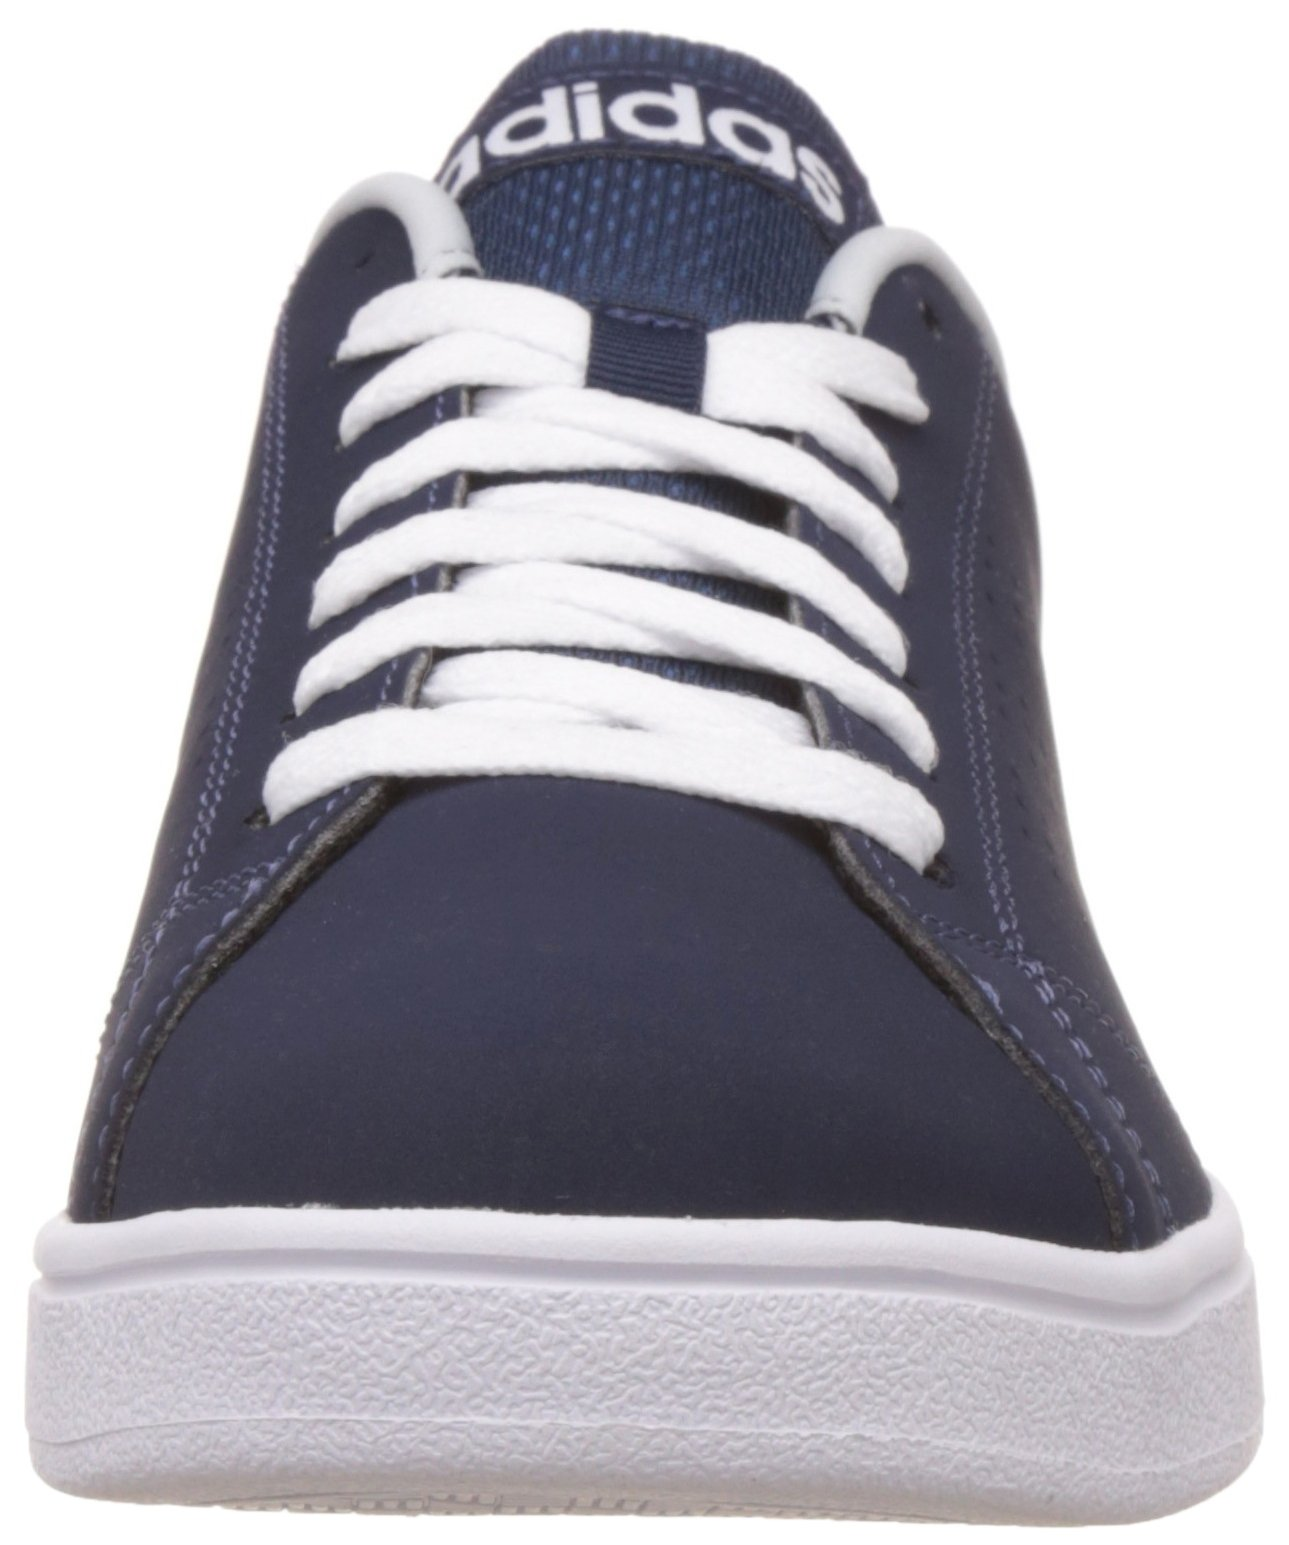 Adidas NEO Advantage Clean VS, Scarpe da Ginnastica Uomo 4 spesavip